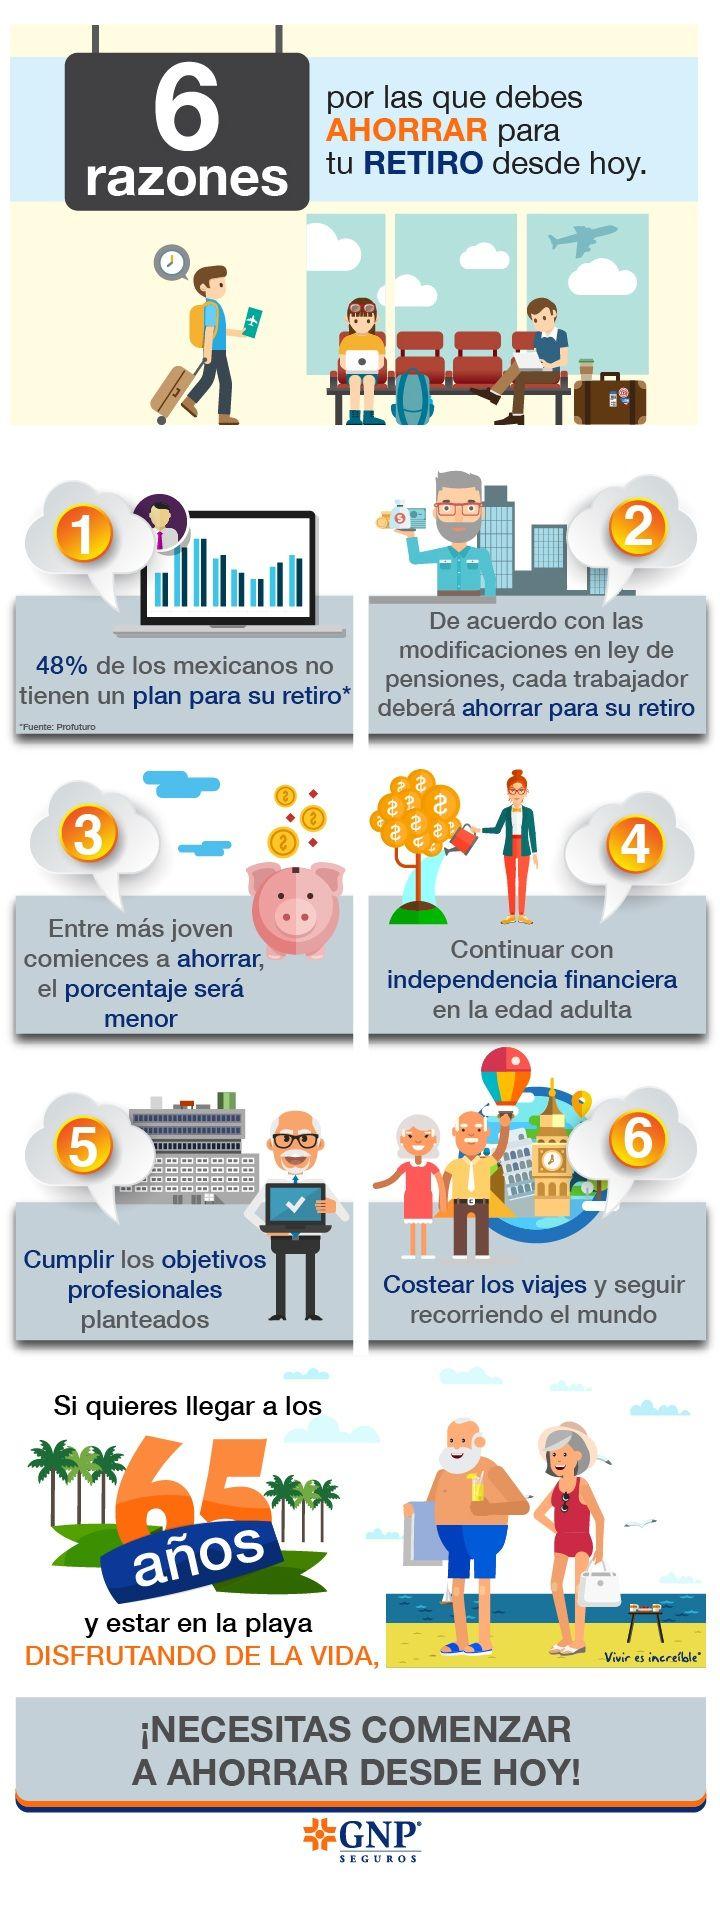 #GNP #seguros #ahorro #dinero #finanzas #viajes #retiro #viviresincreíble